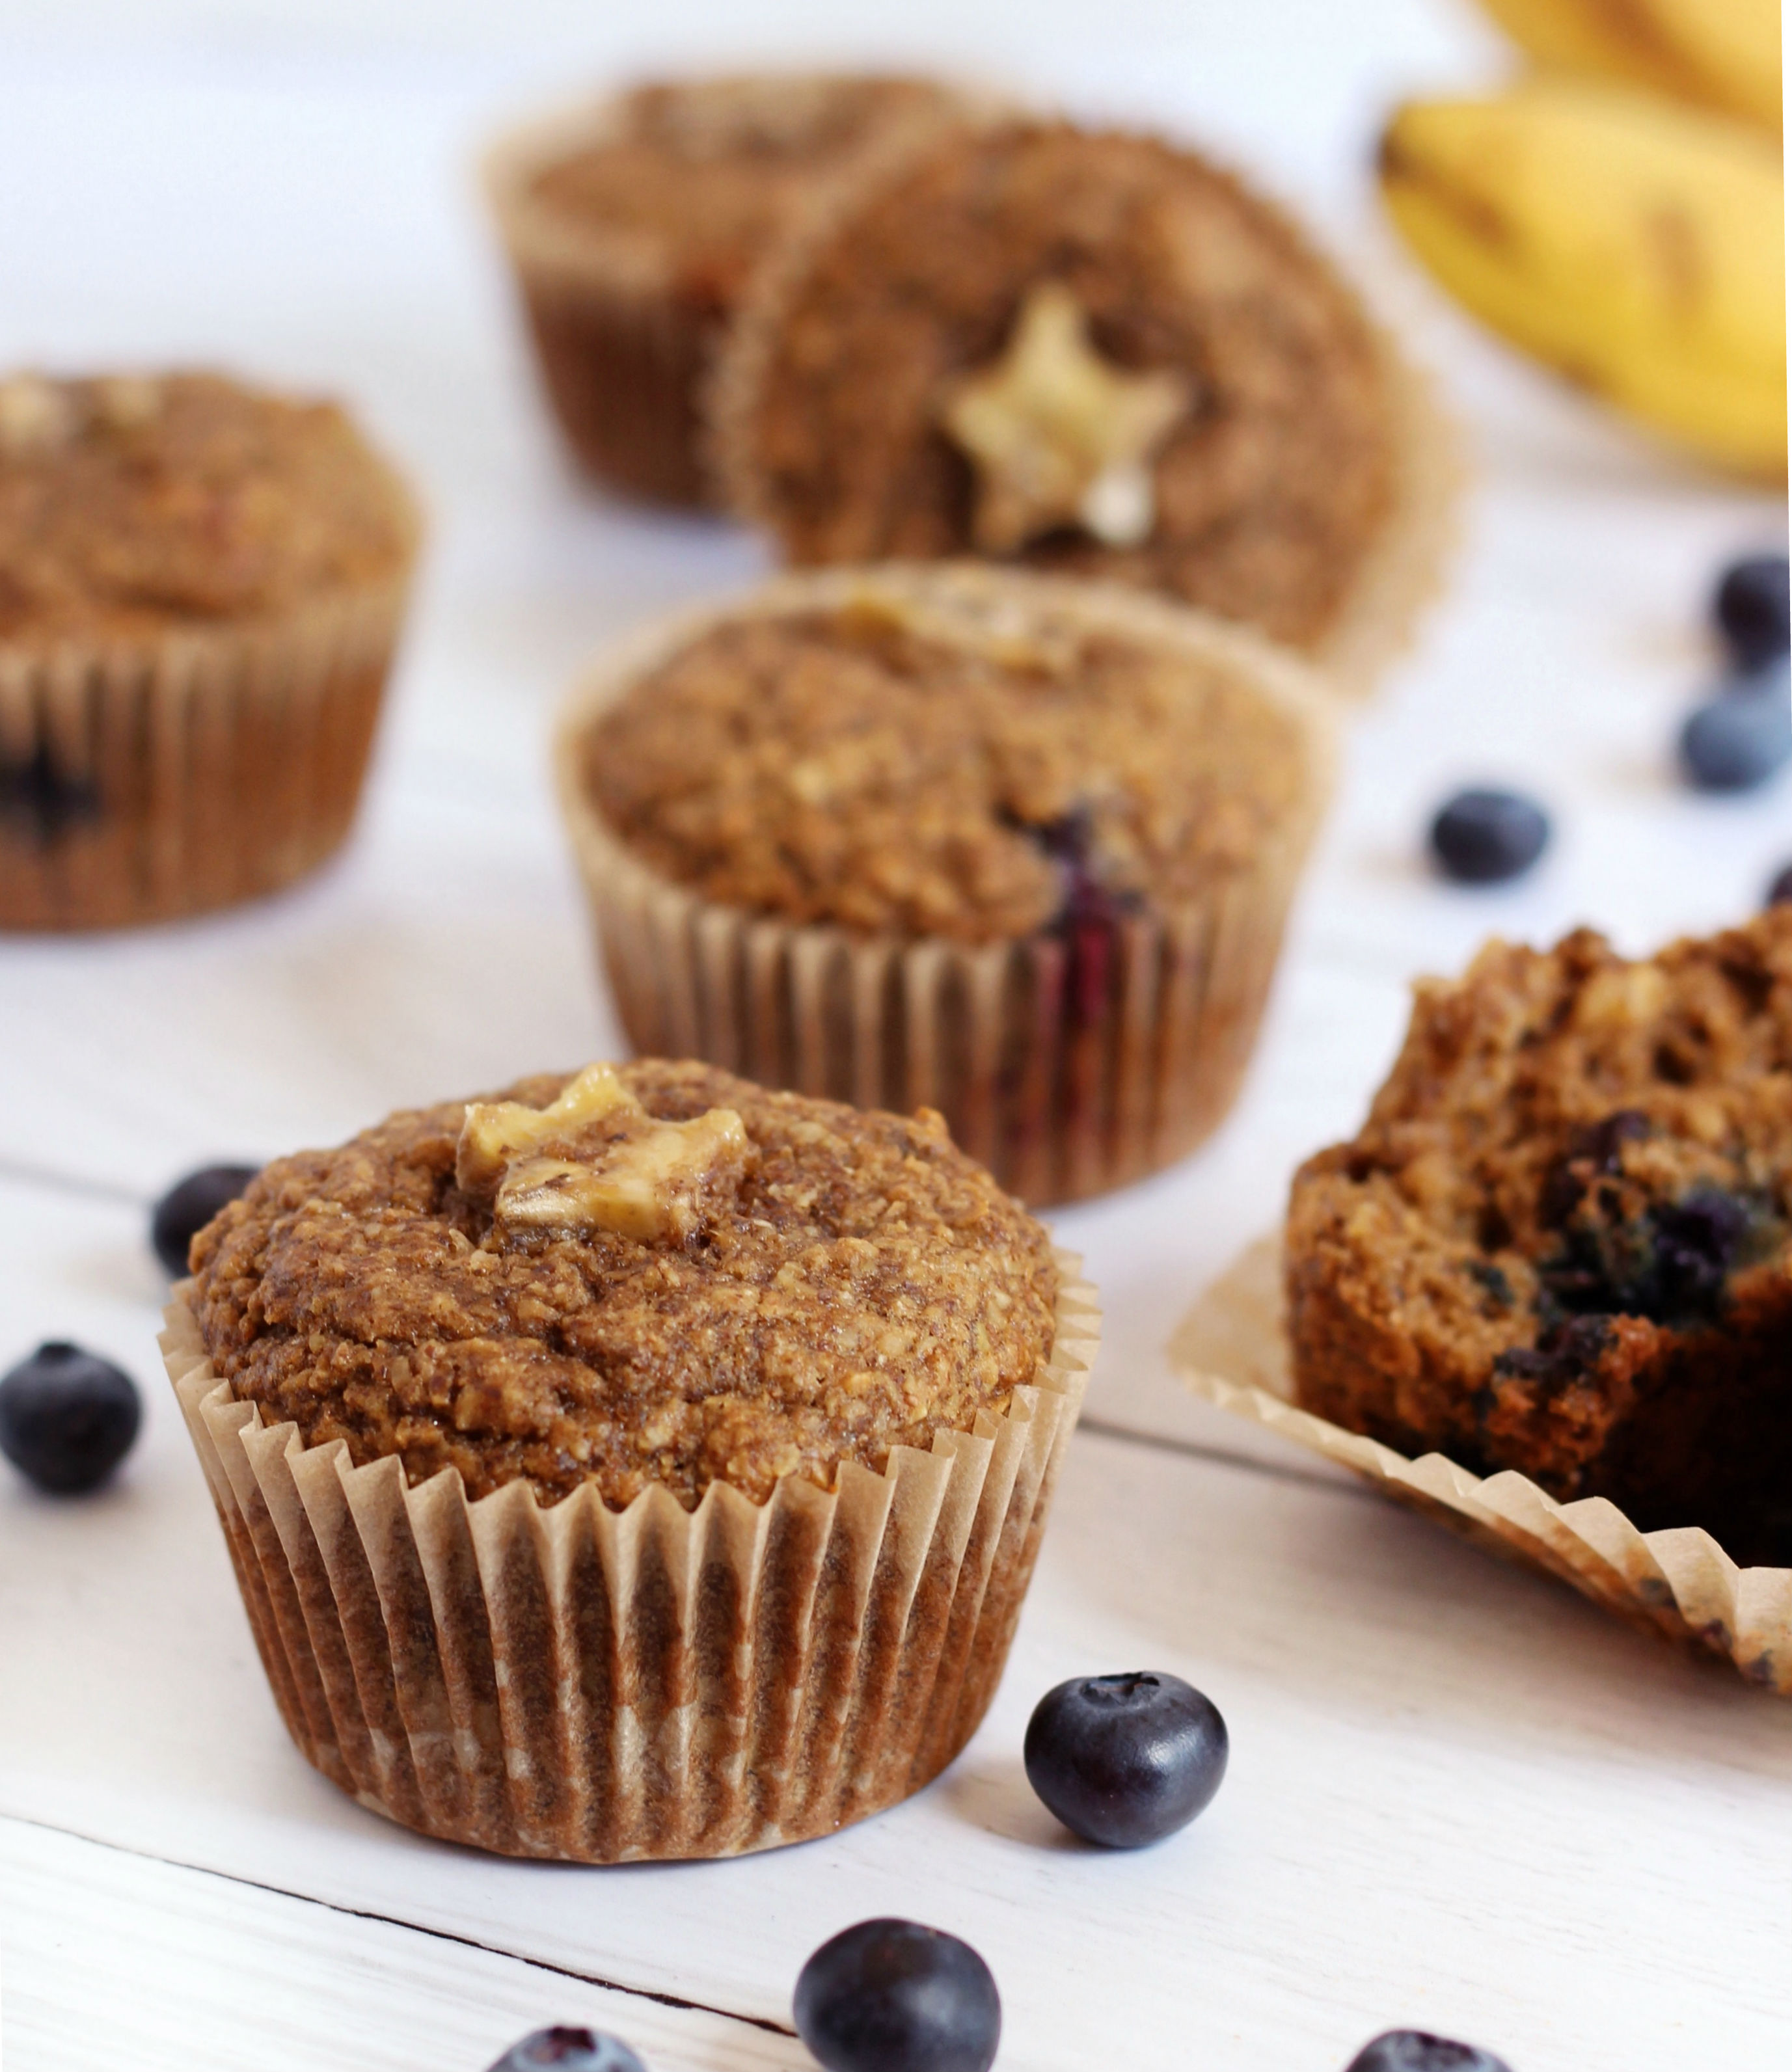 Dairy Free Blueberry Banana Muffins